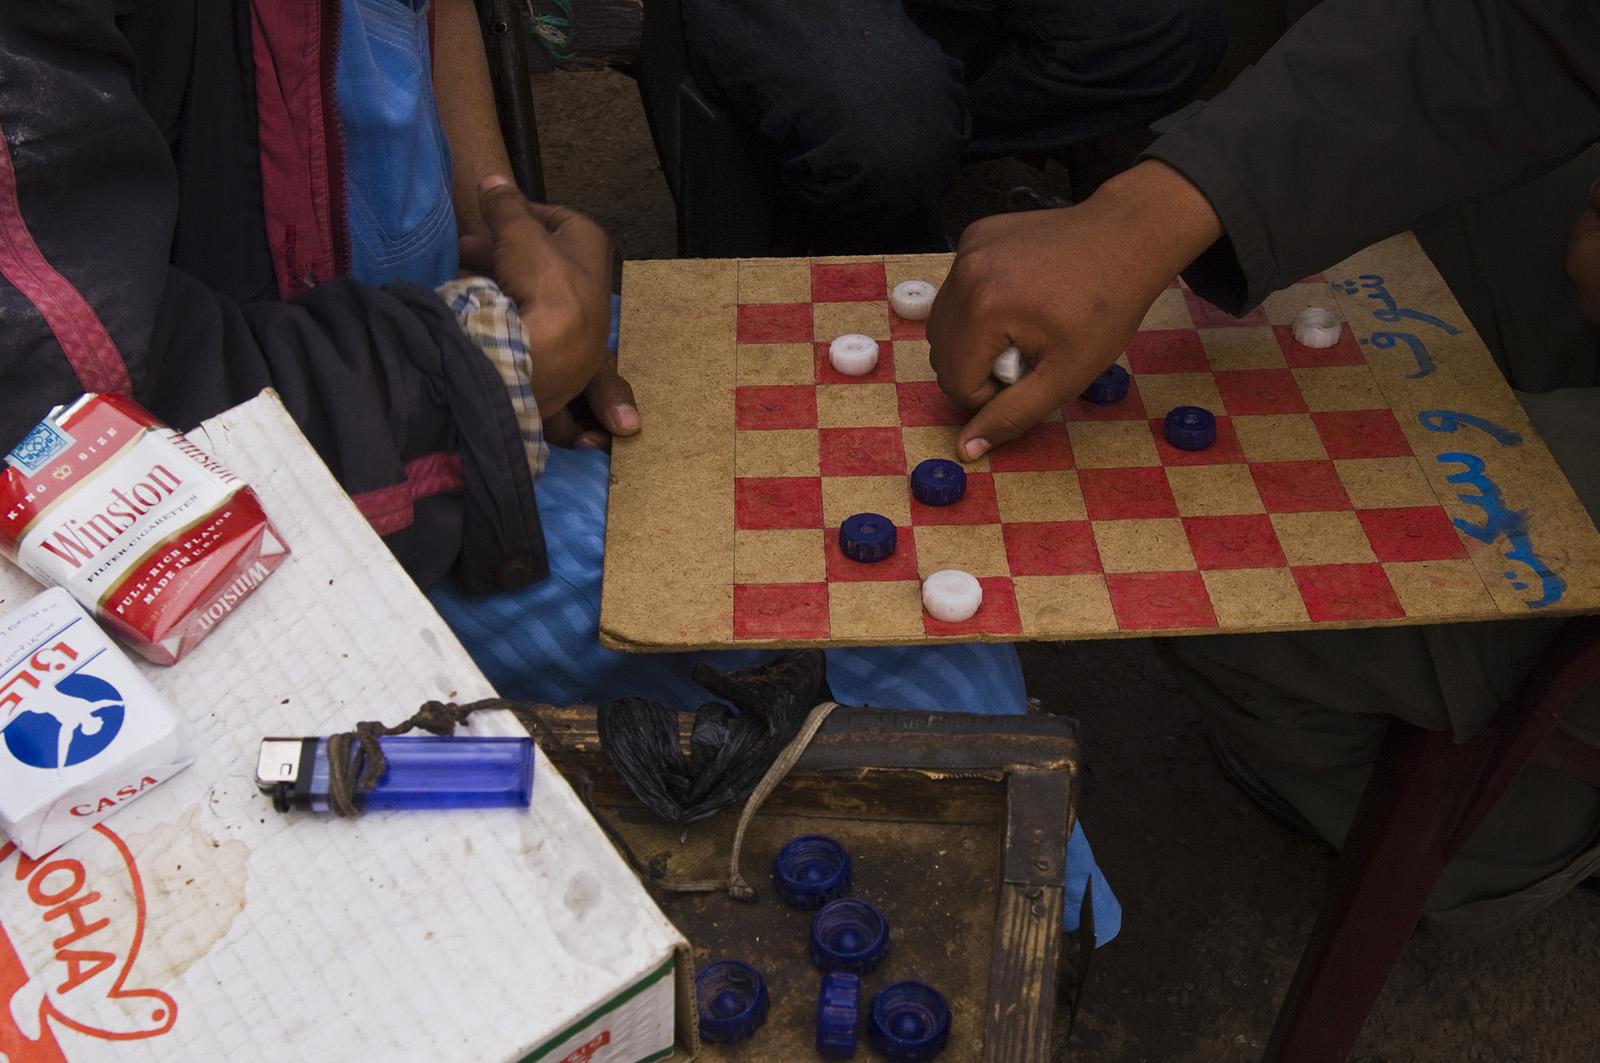 foto van schaakbord in Marokko